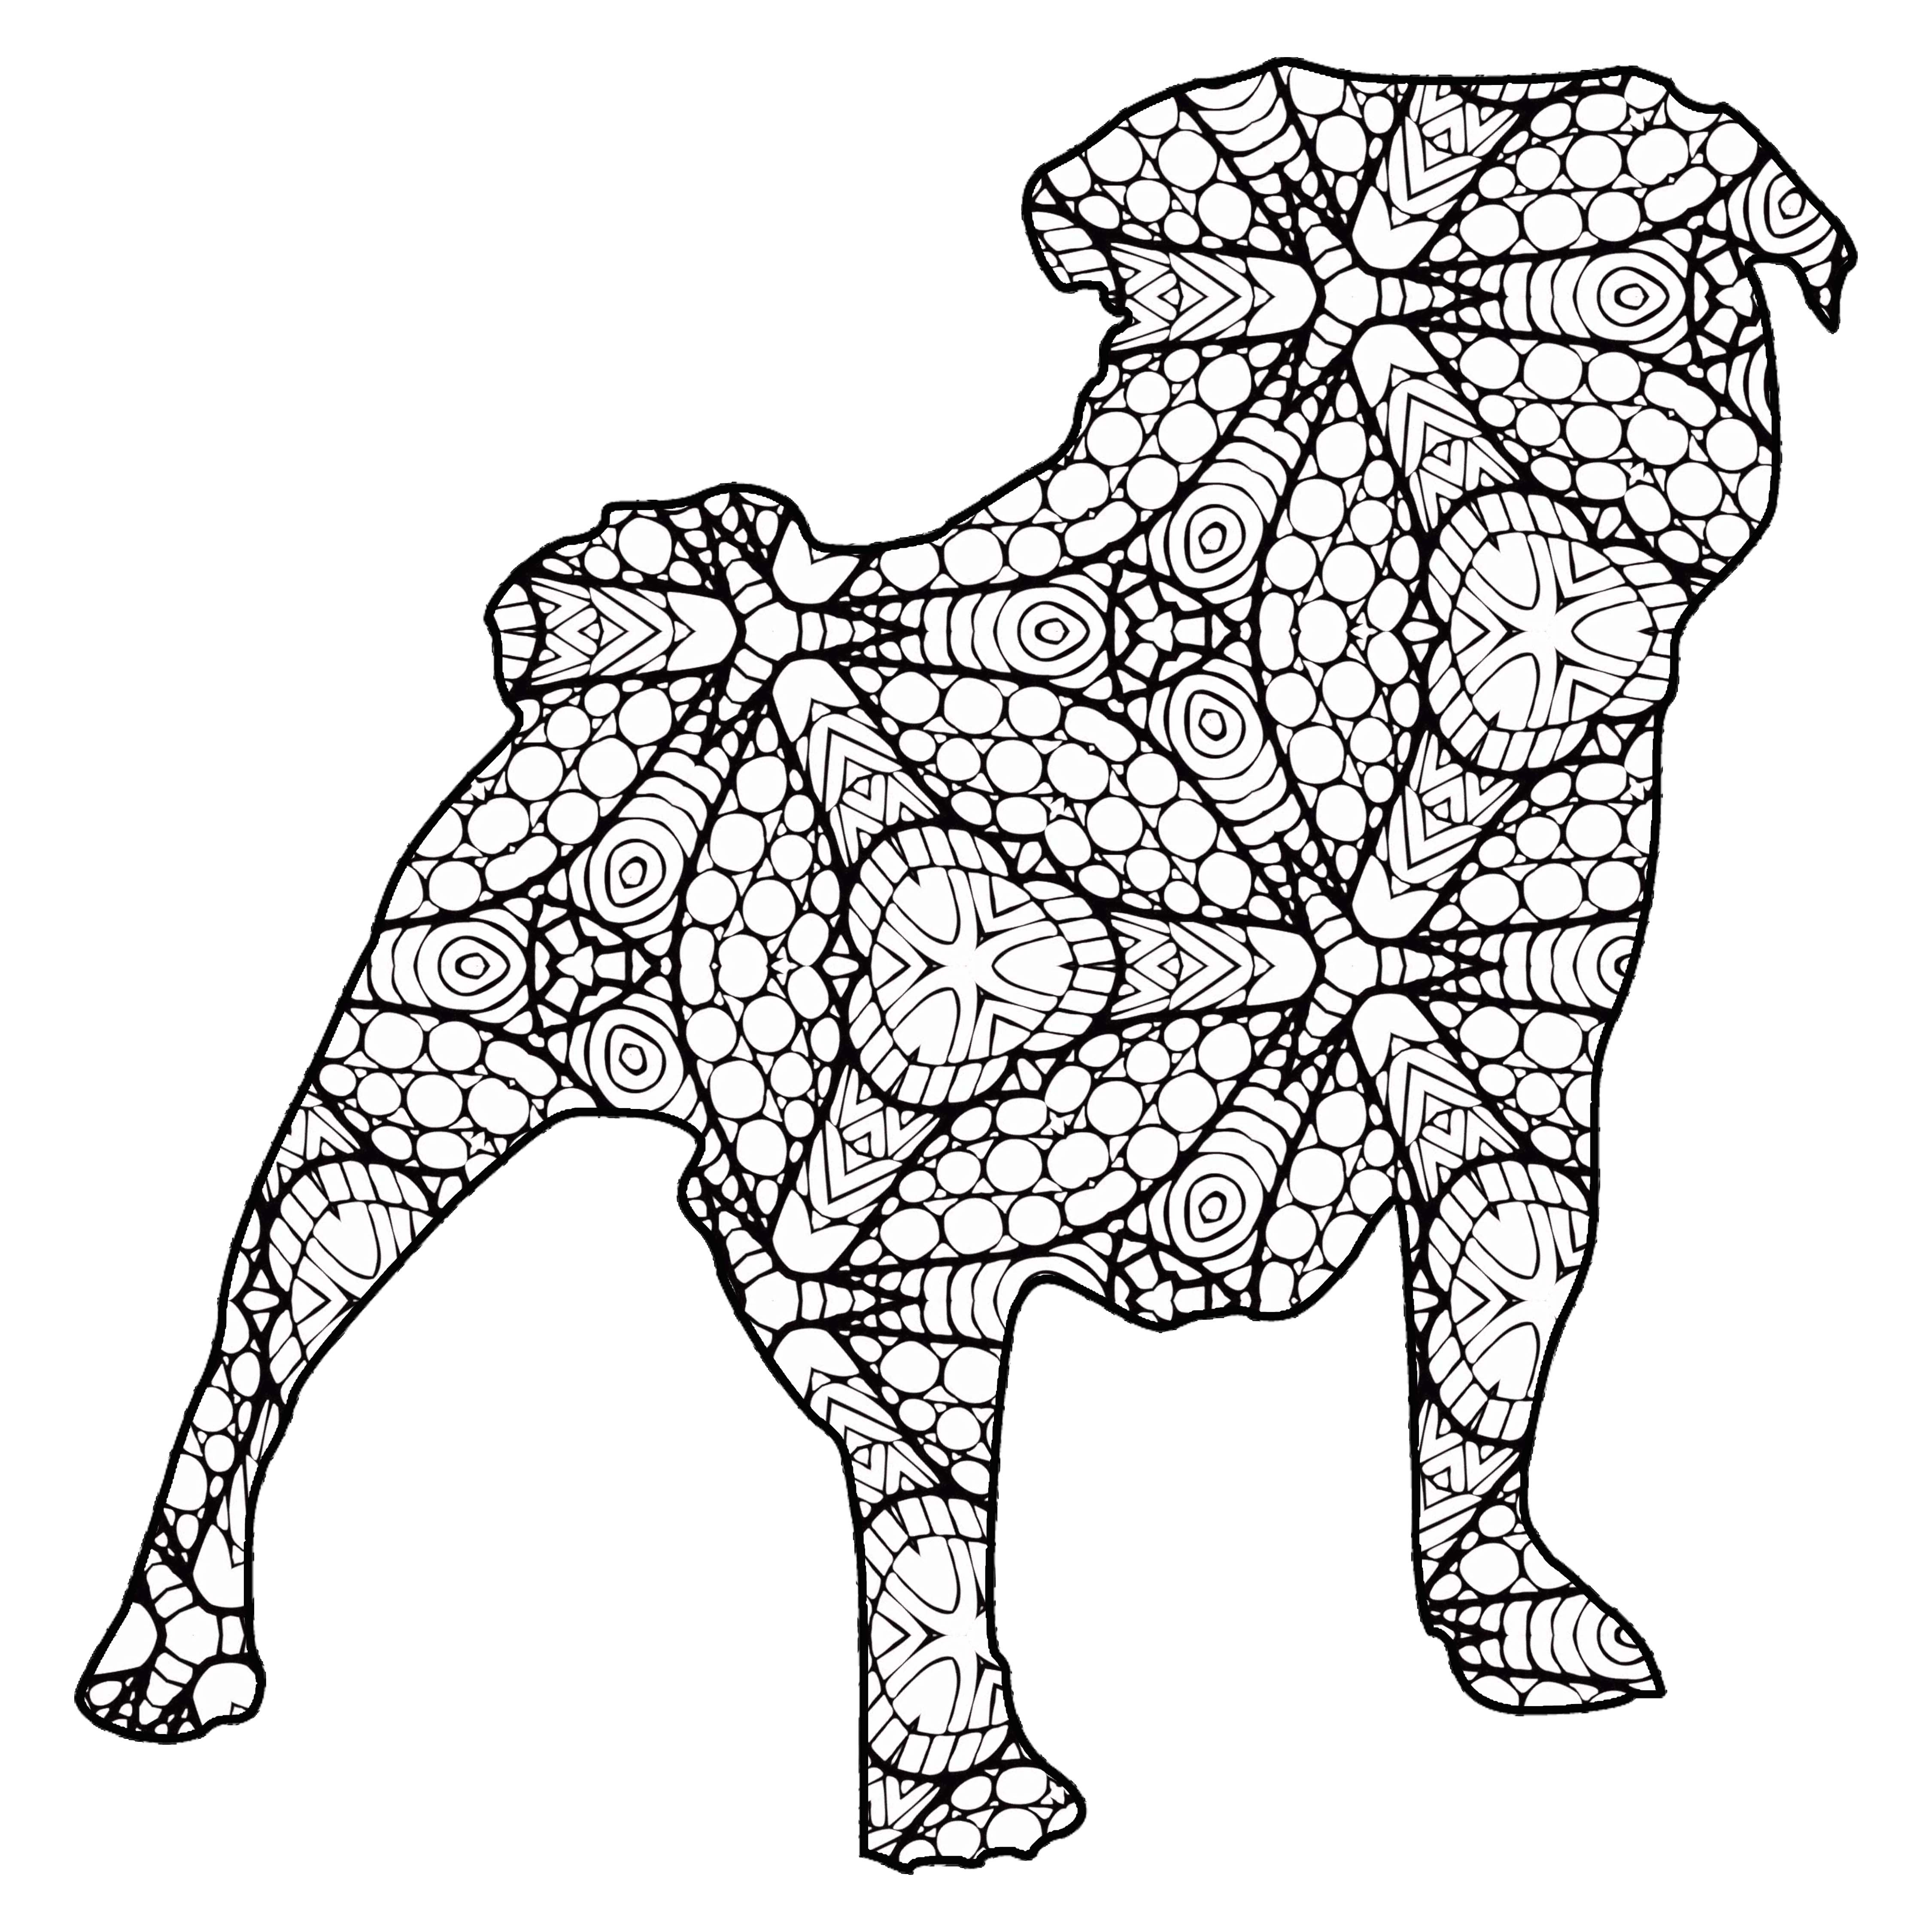 30 Free Printable Geometric Animal